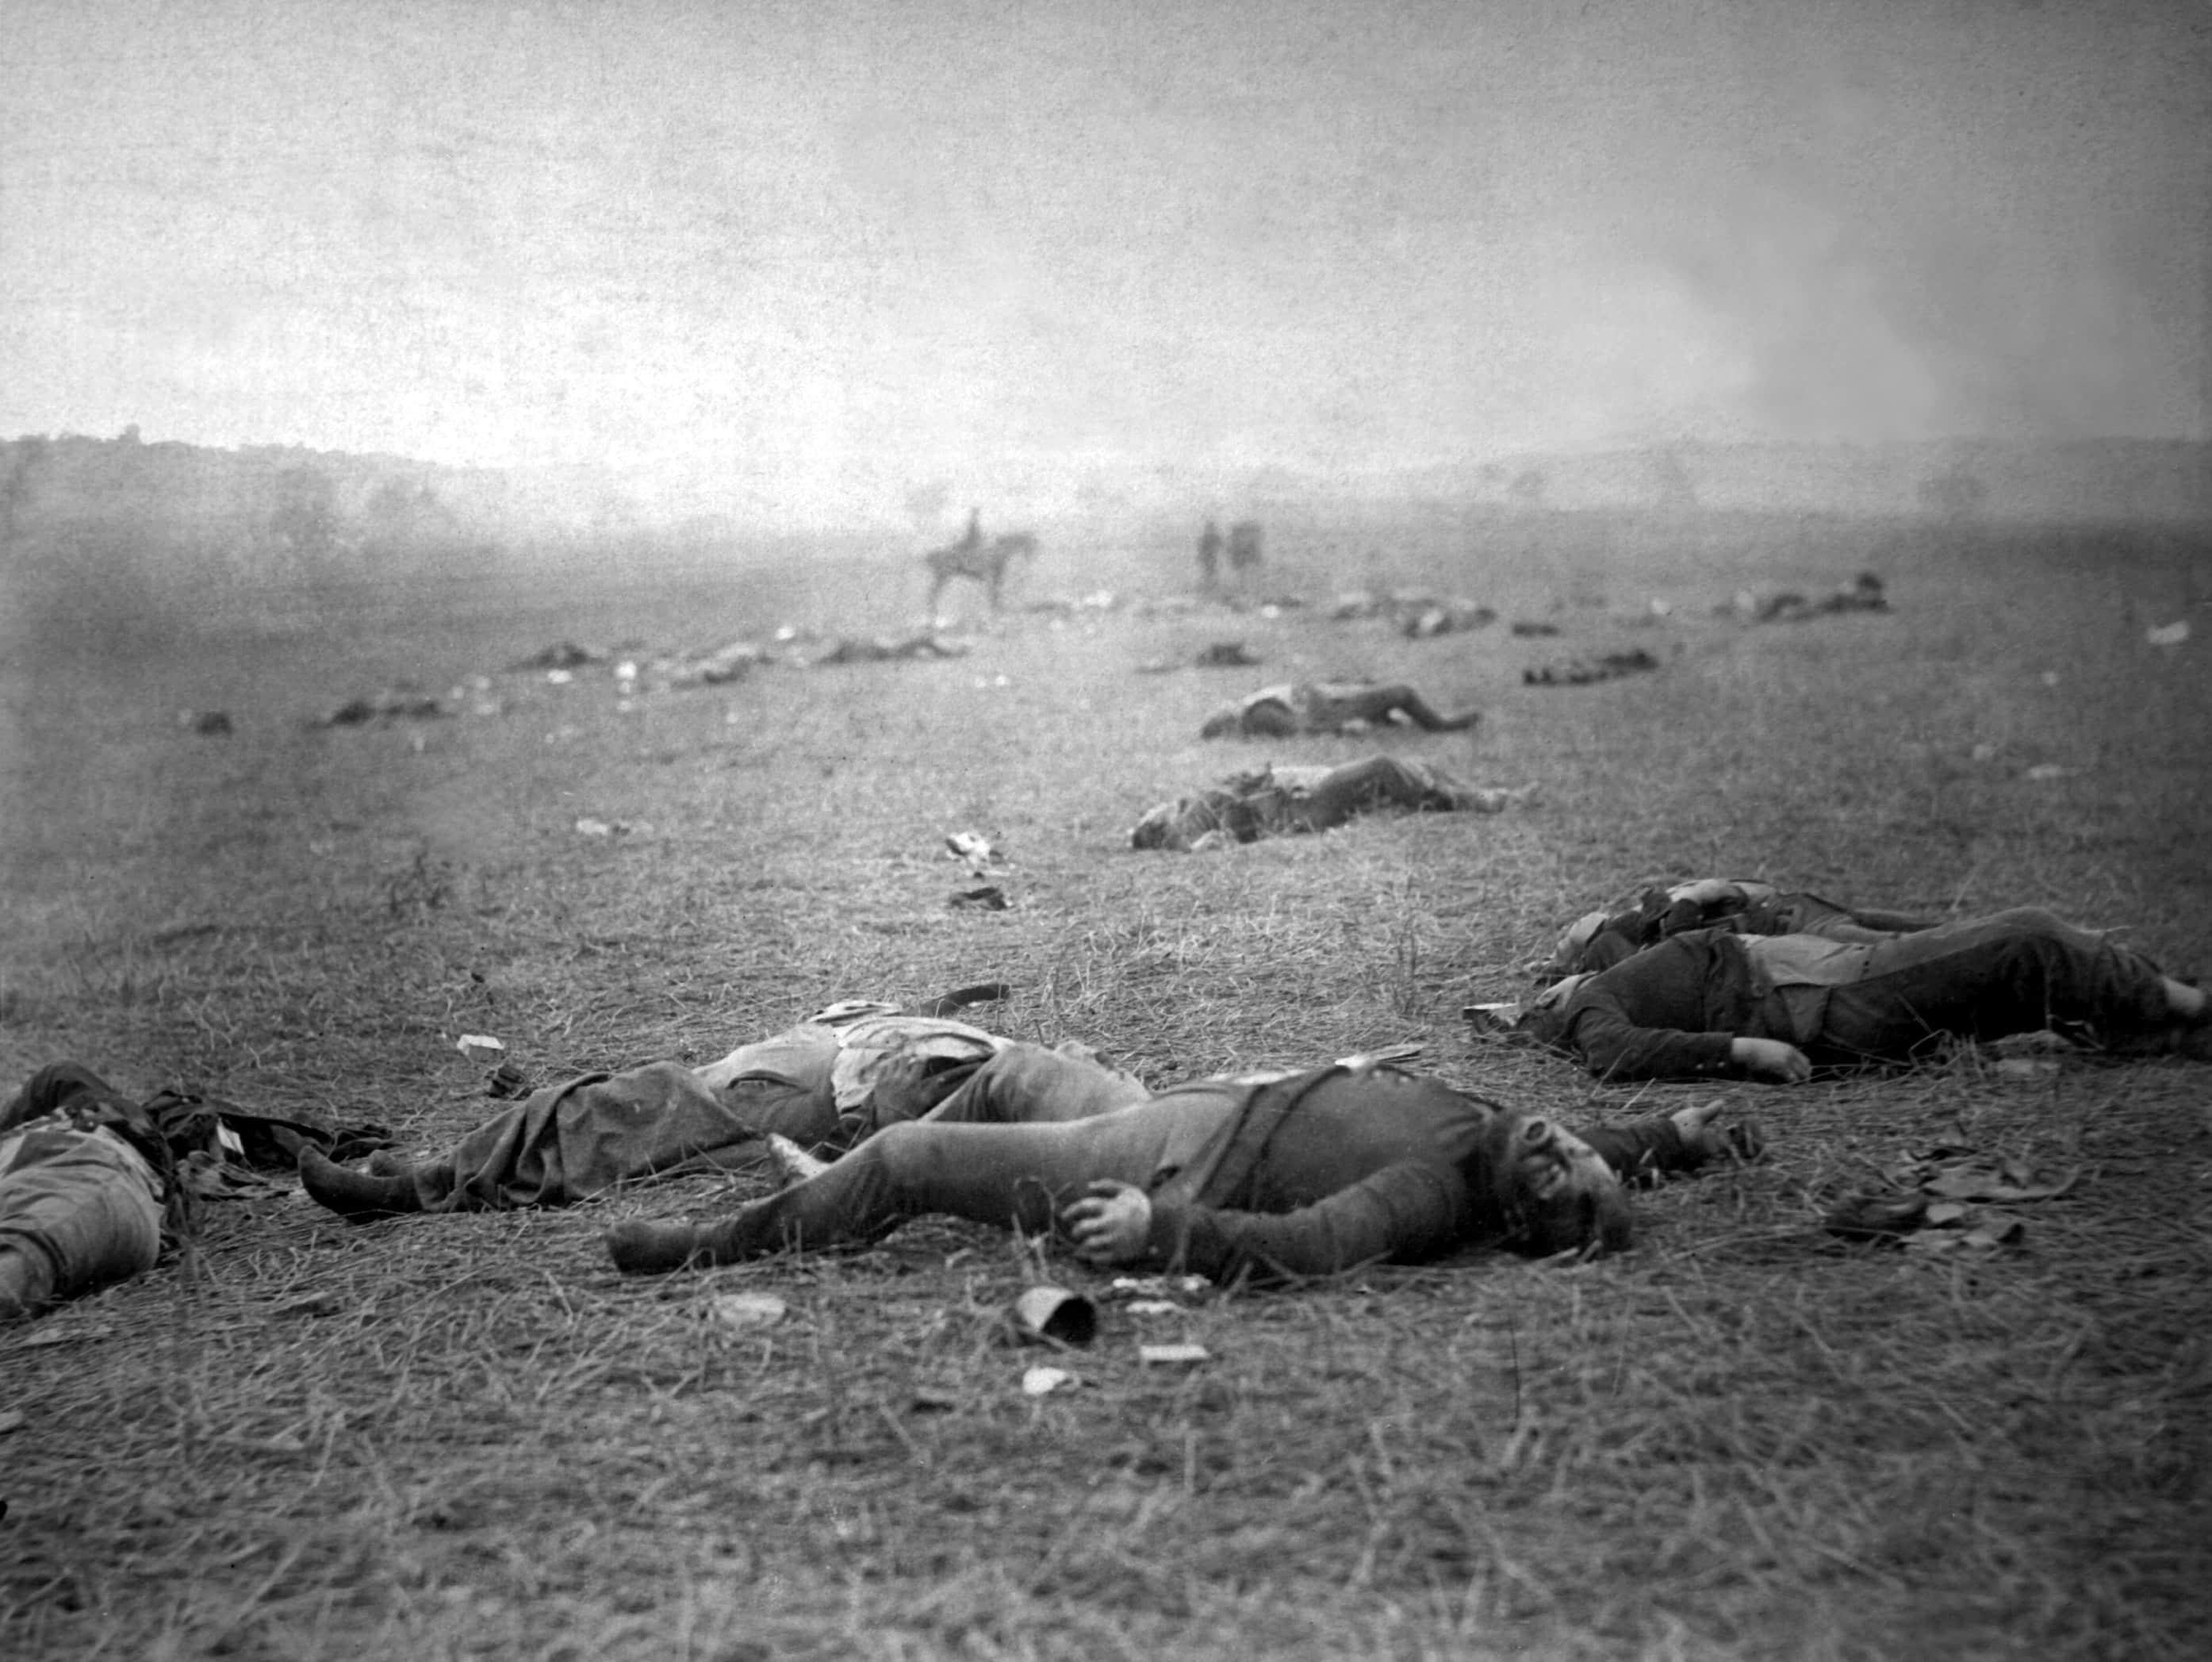 Battle of Gettysburg min image